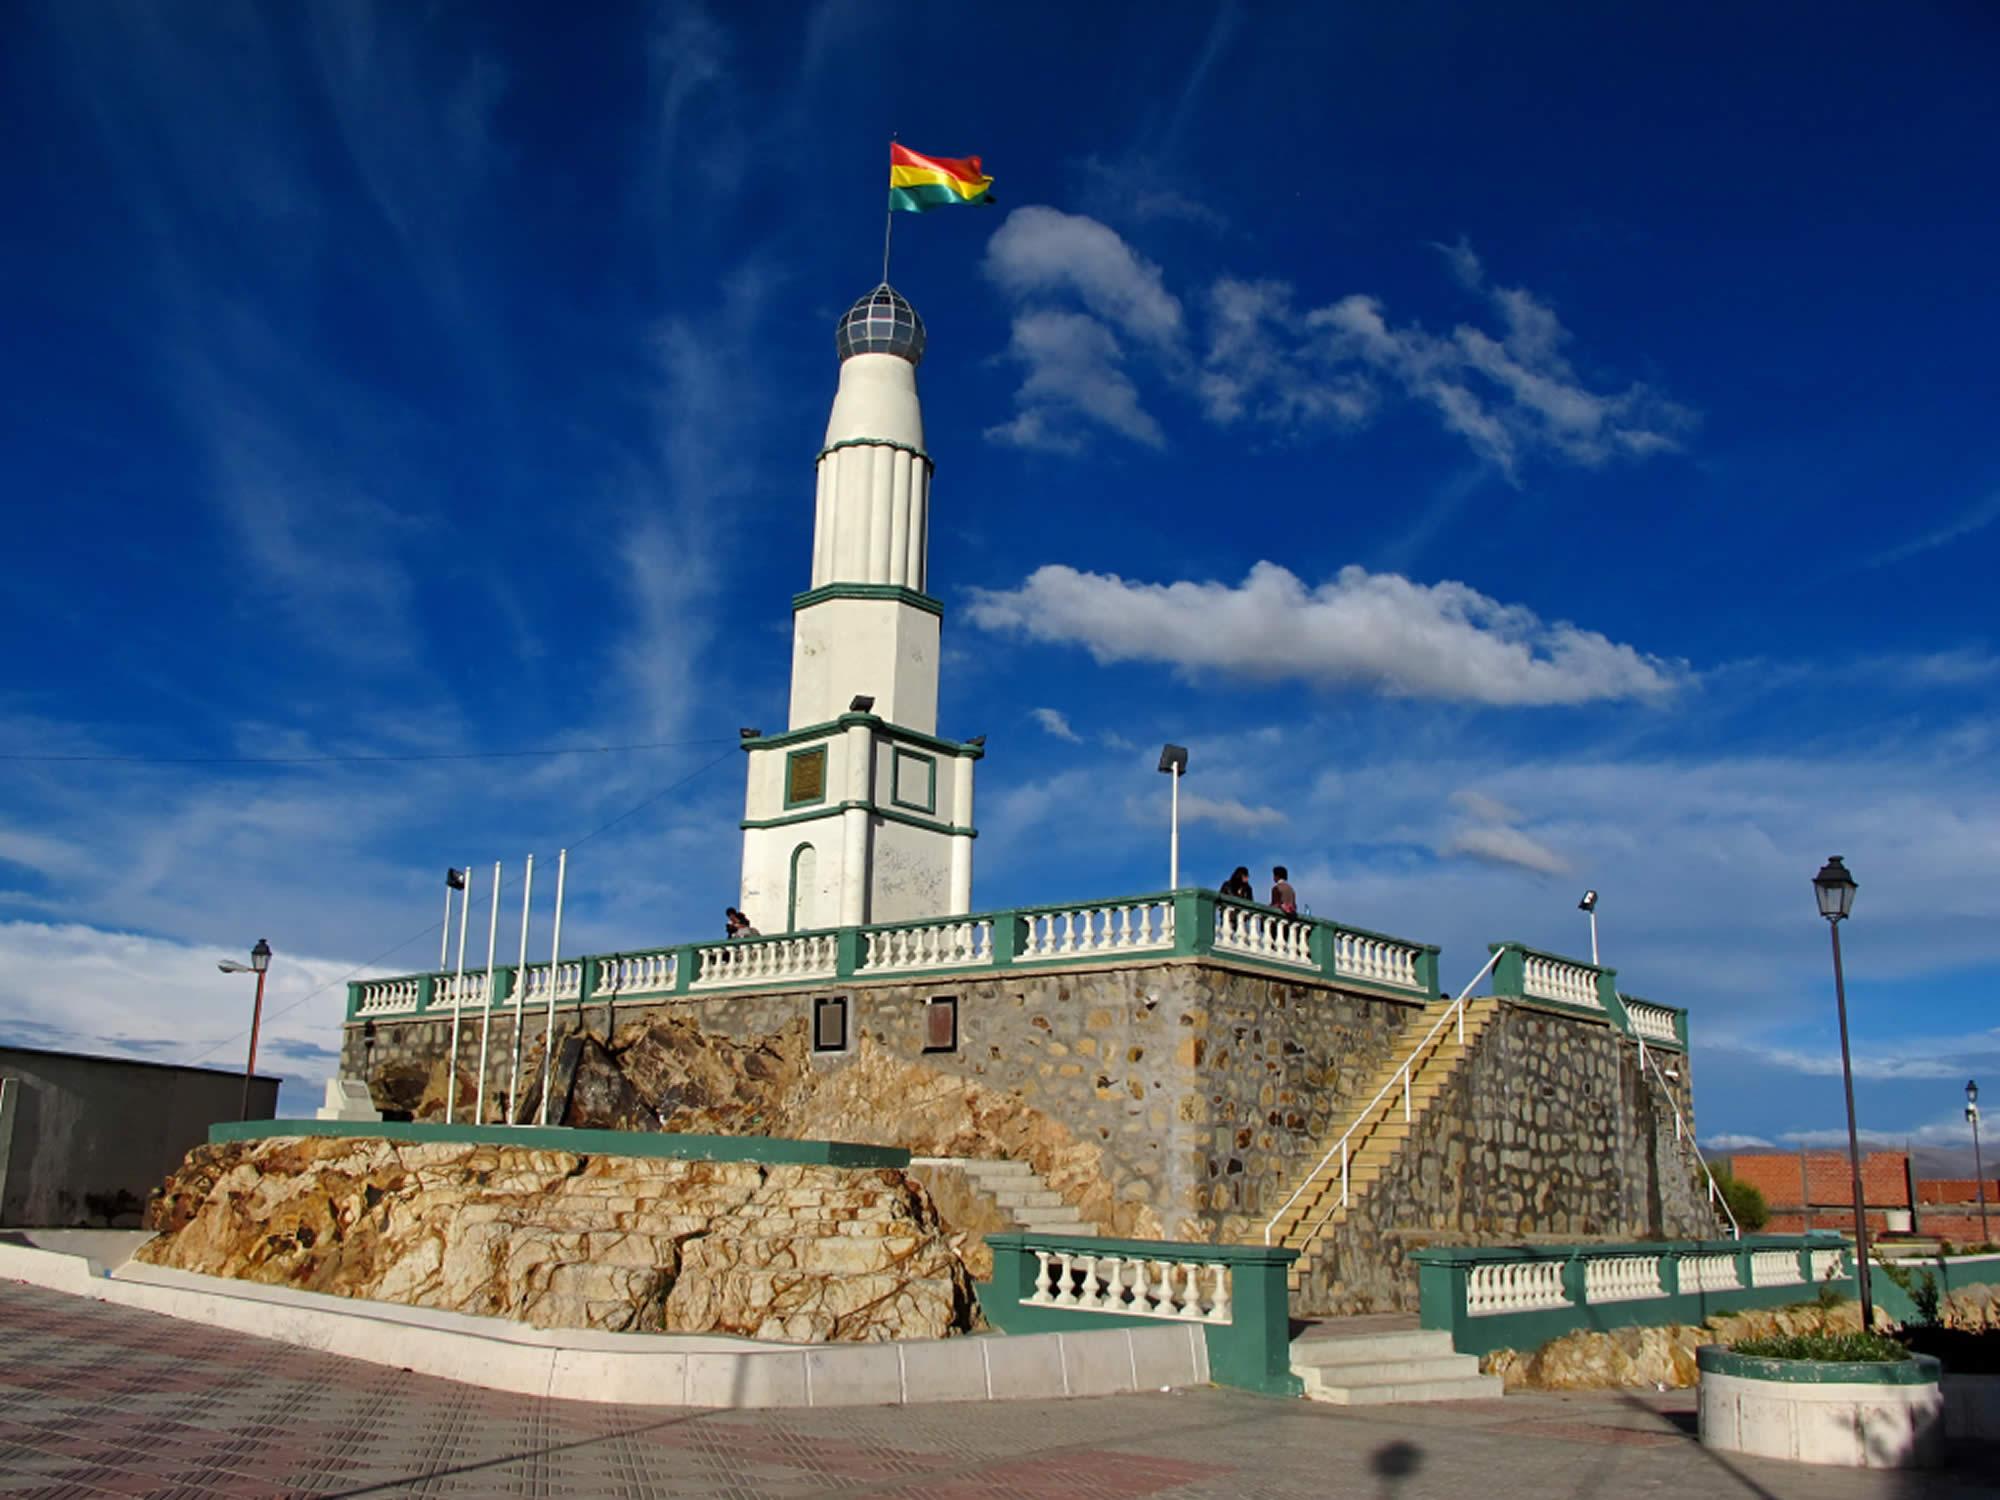 Lighthouse of Conchupata, Oruro